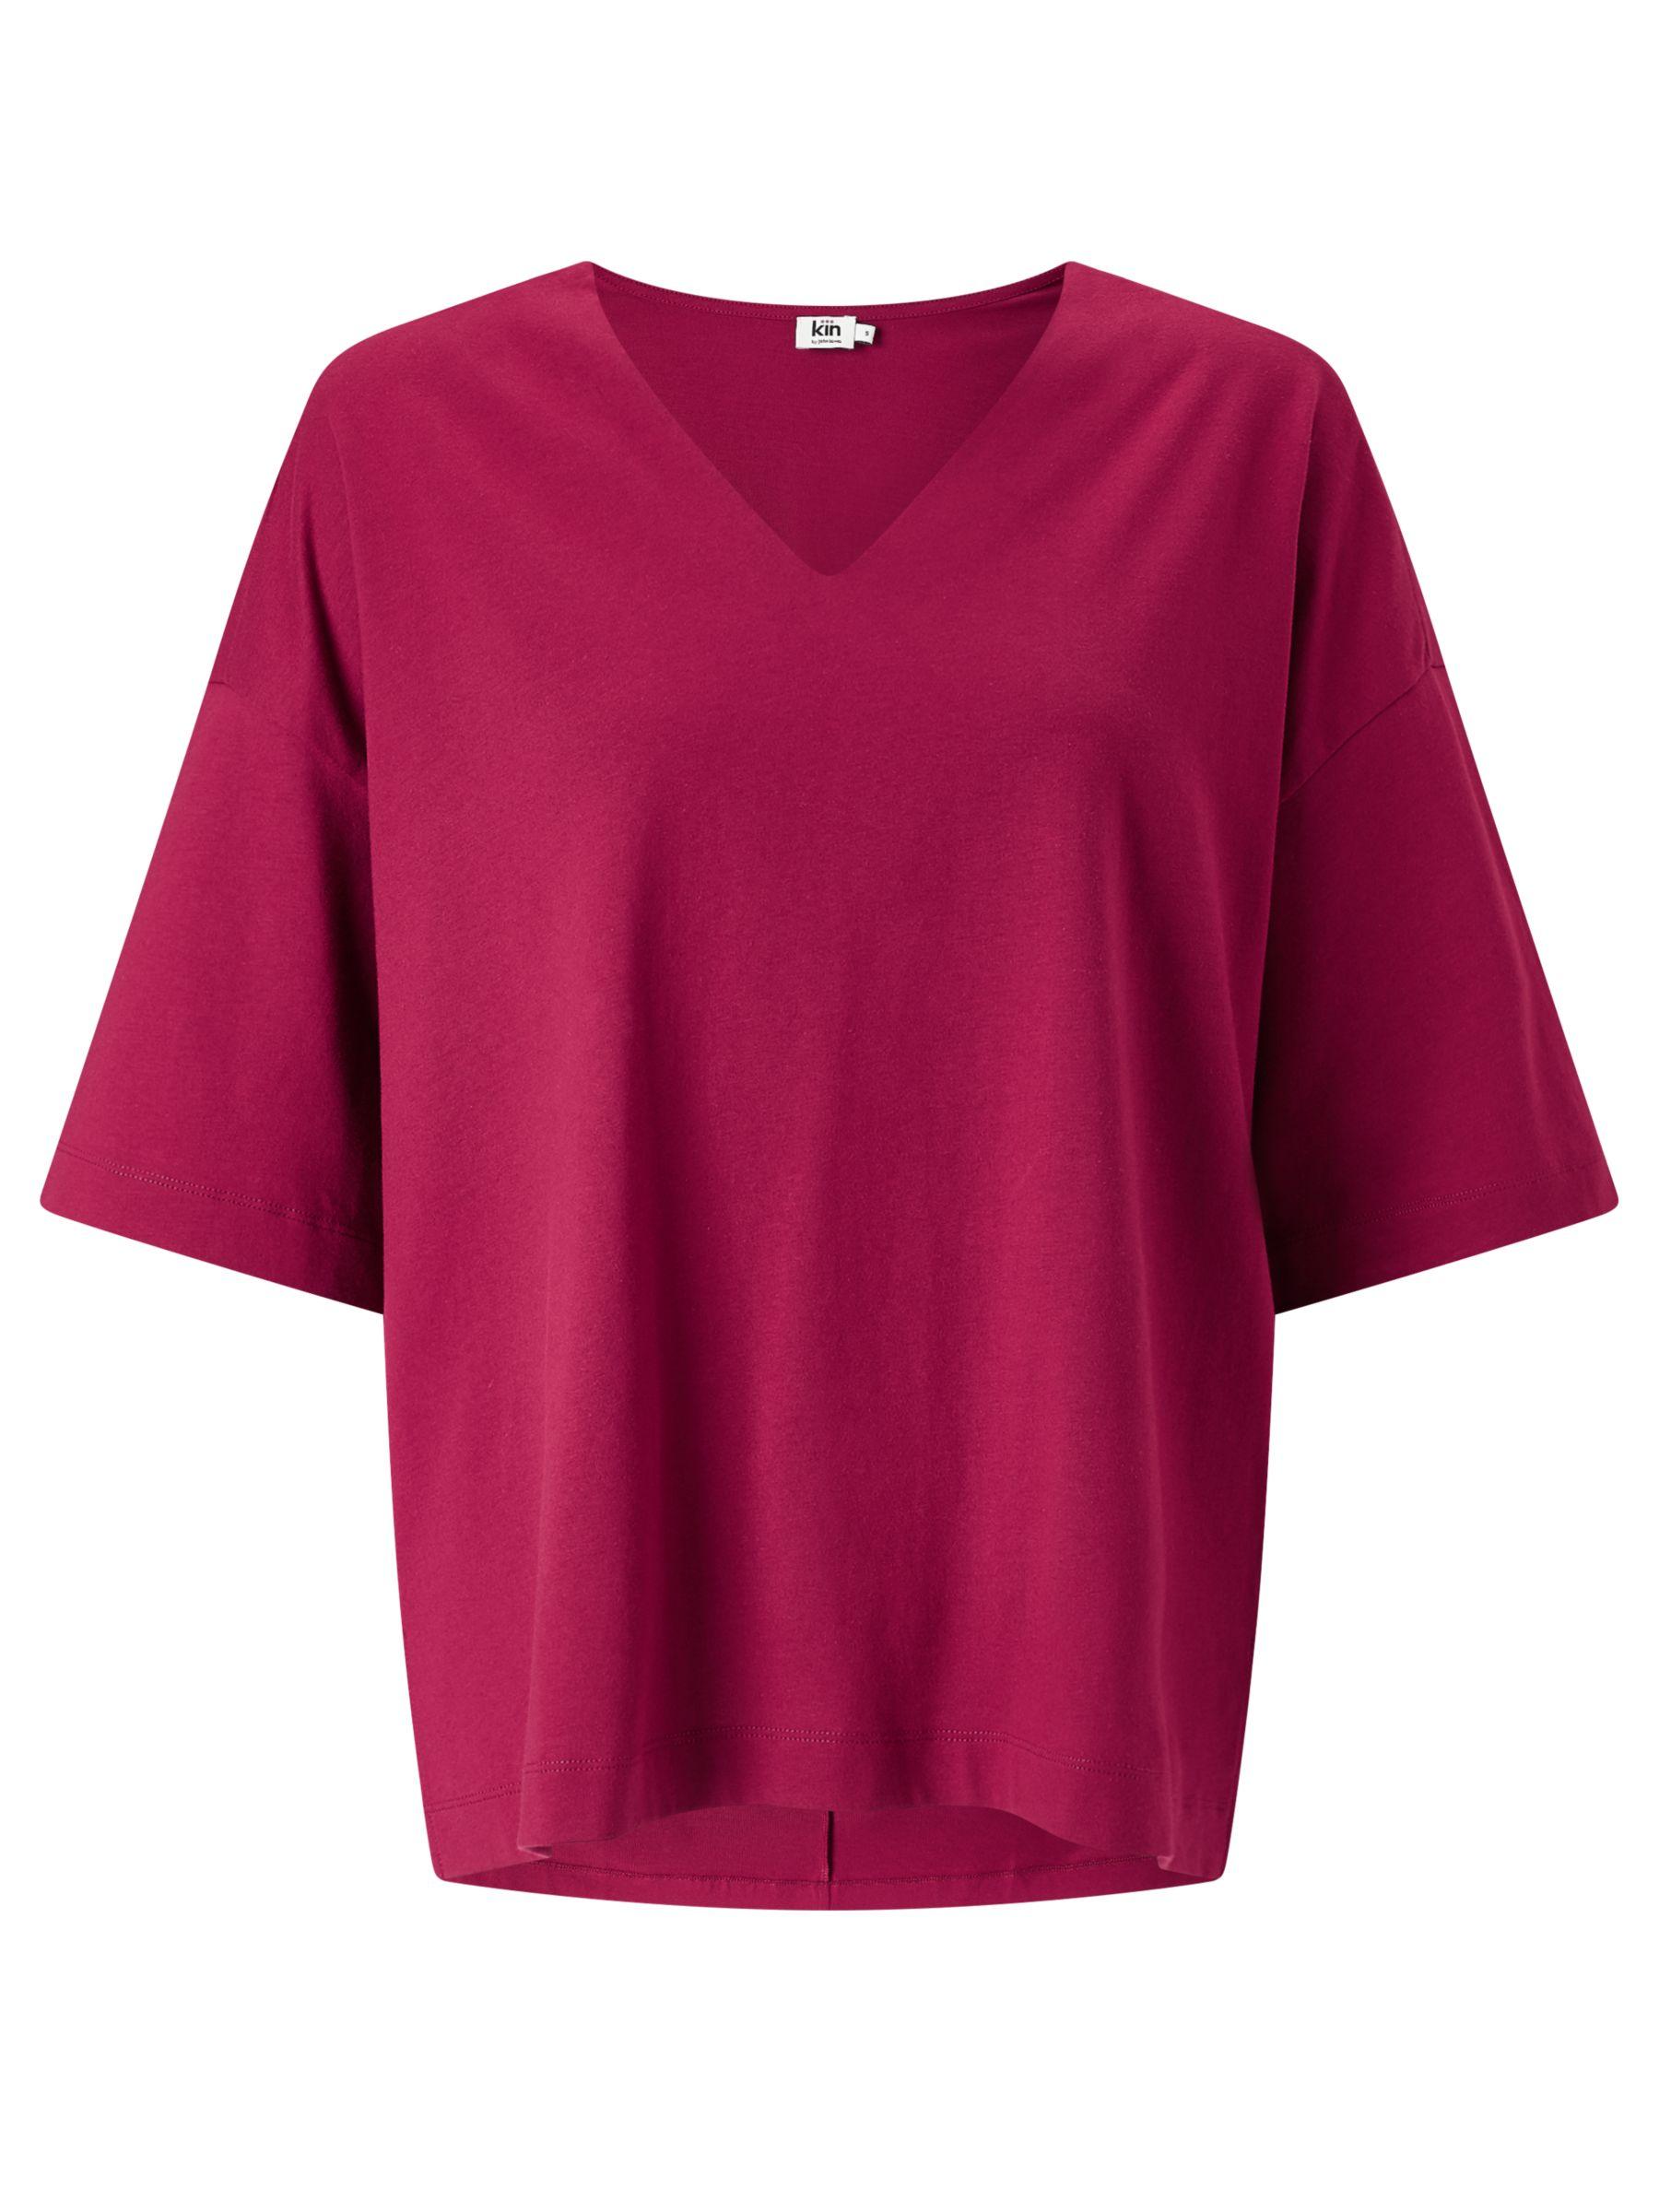 Kin by John Lewis Kin by John Lewis V-Neck Oversized T-Shirt